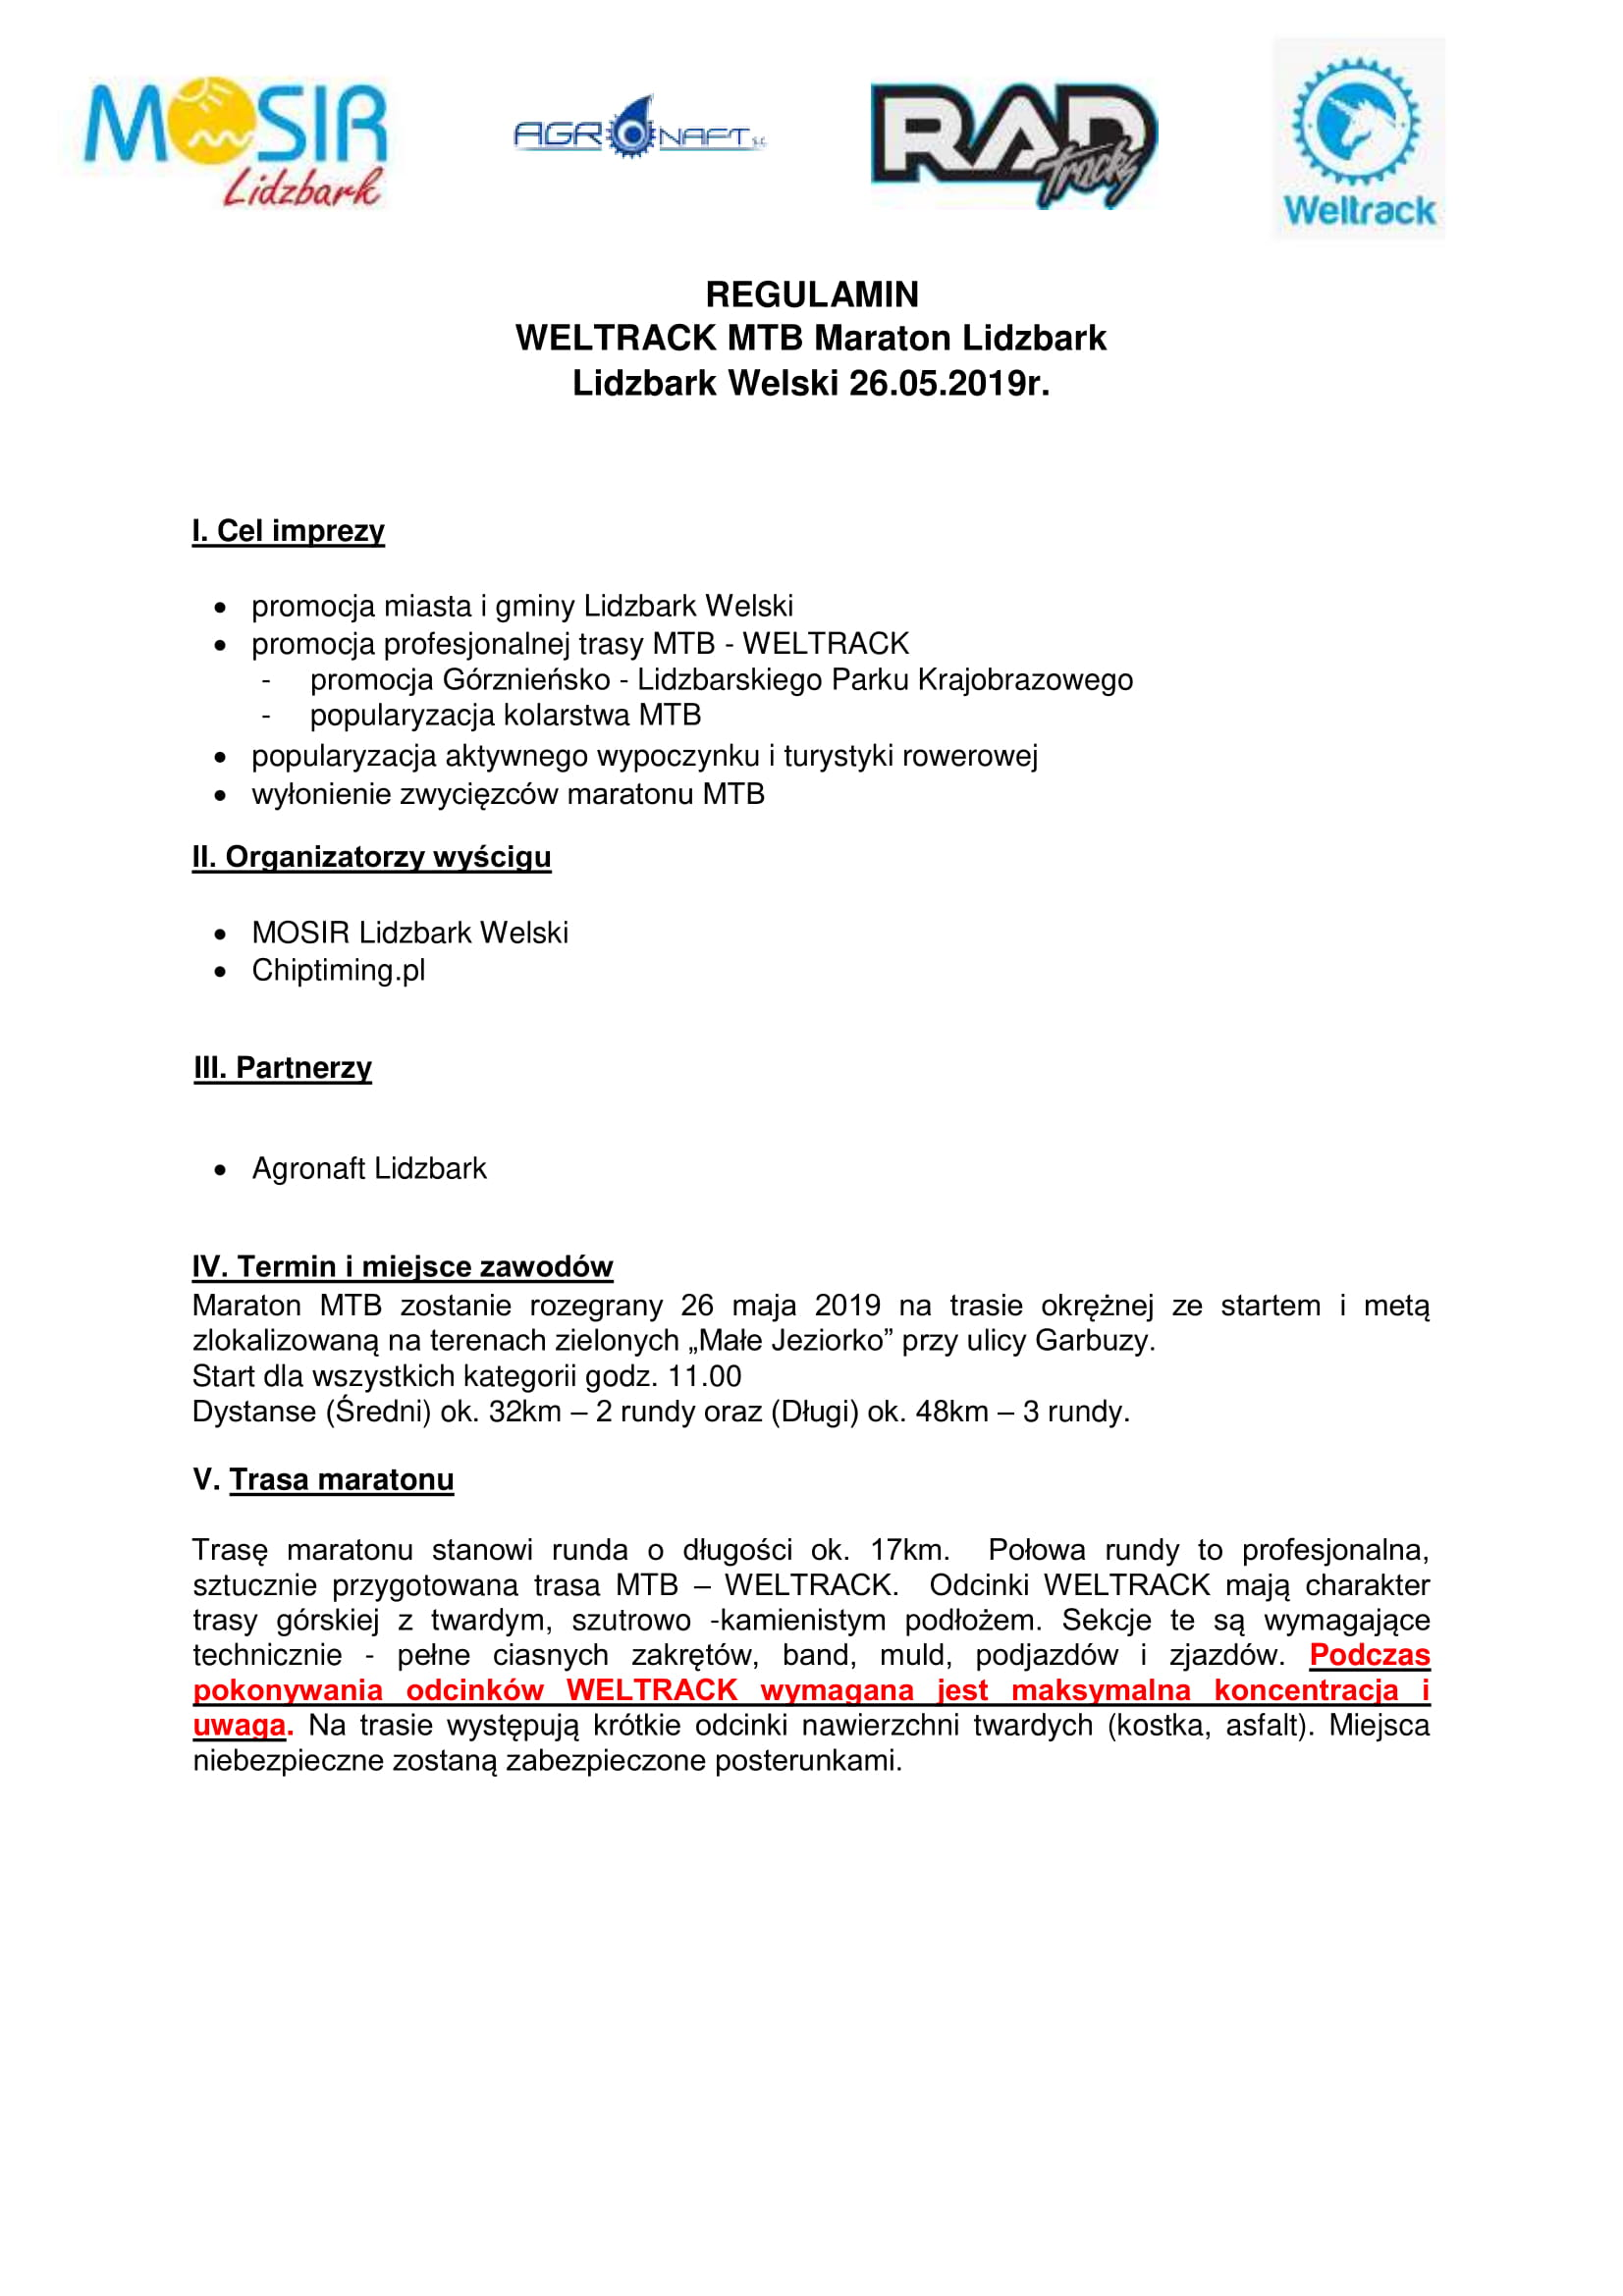 LIDZBARK-WELSKI-WELTRACK-MTB-MARATON-REGULAMIN-2018-12-1